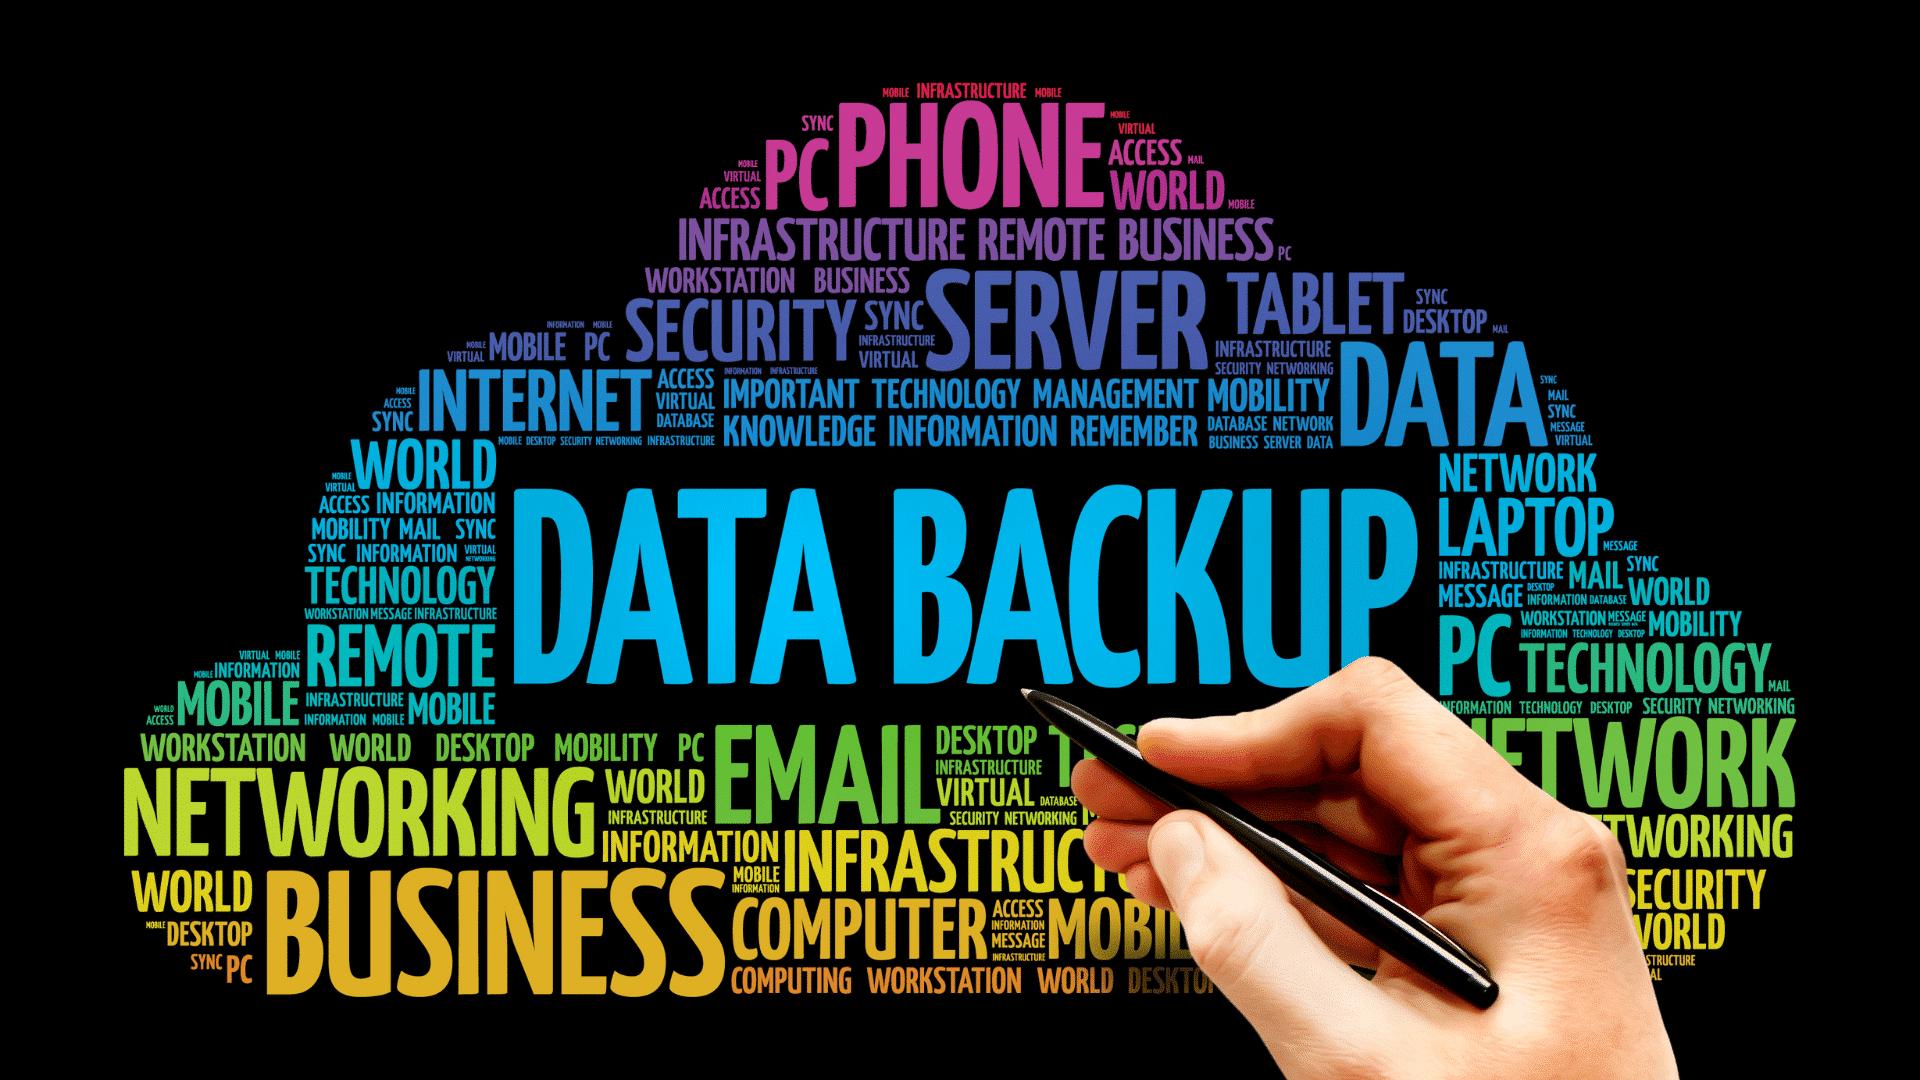 Data backup tag clpoud